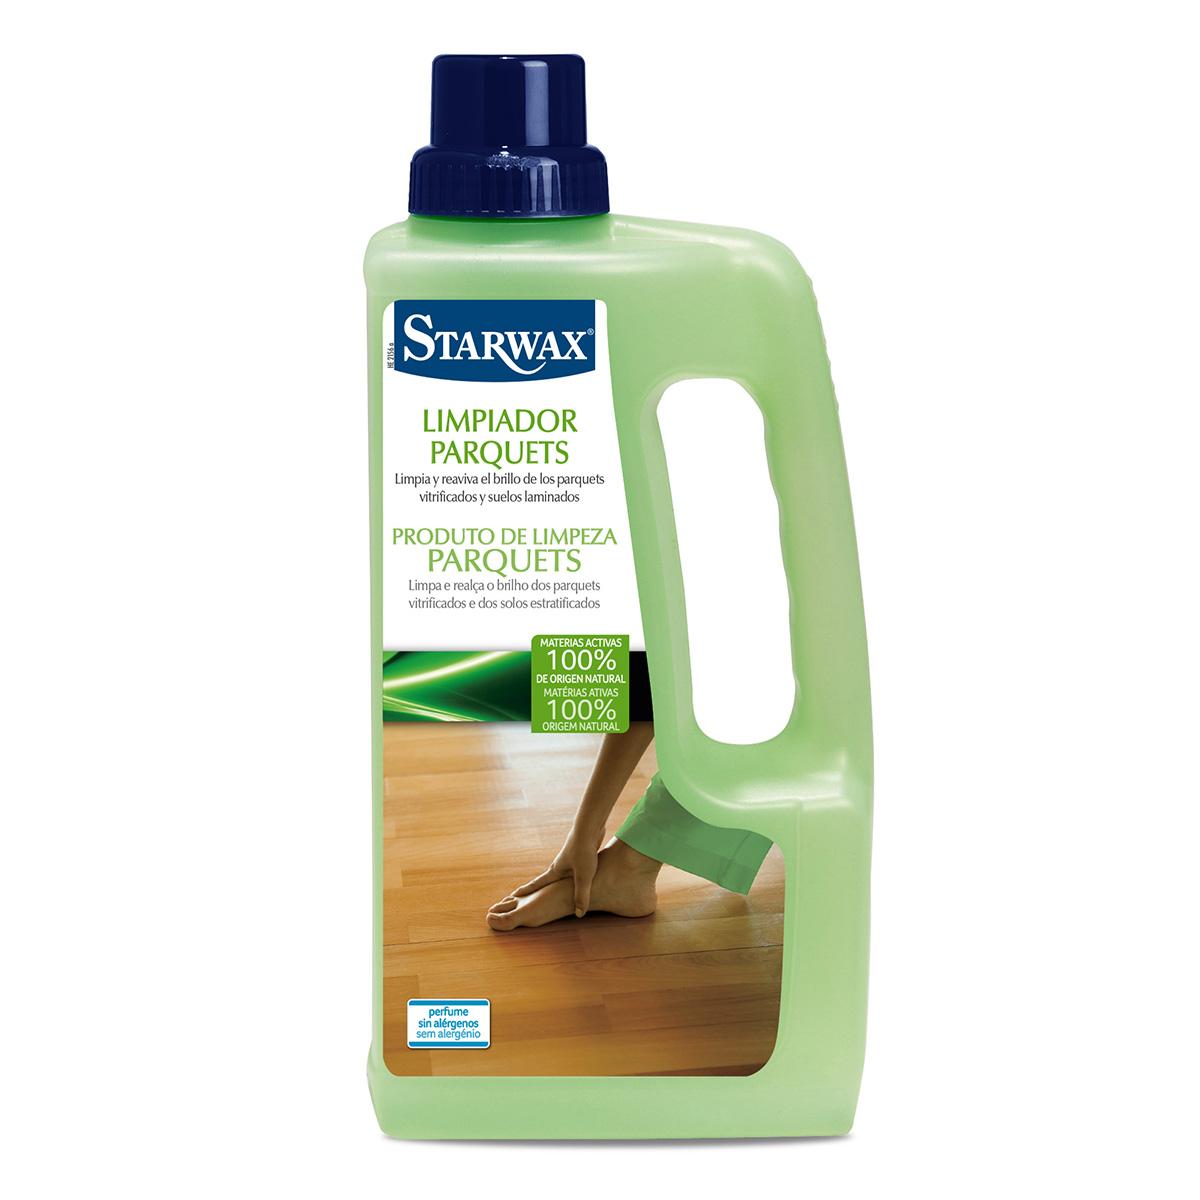 Limpiador parquet - Starwax